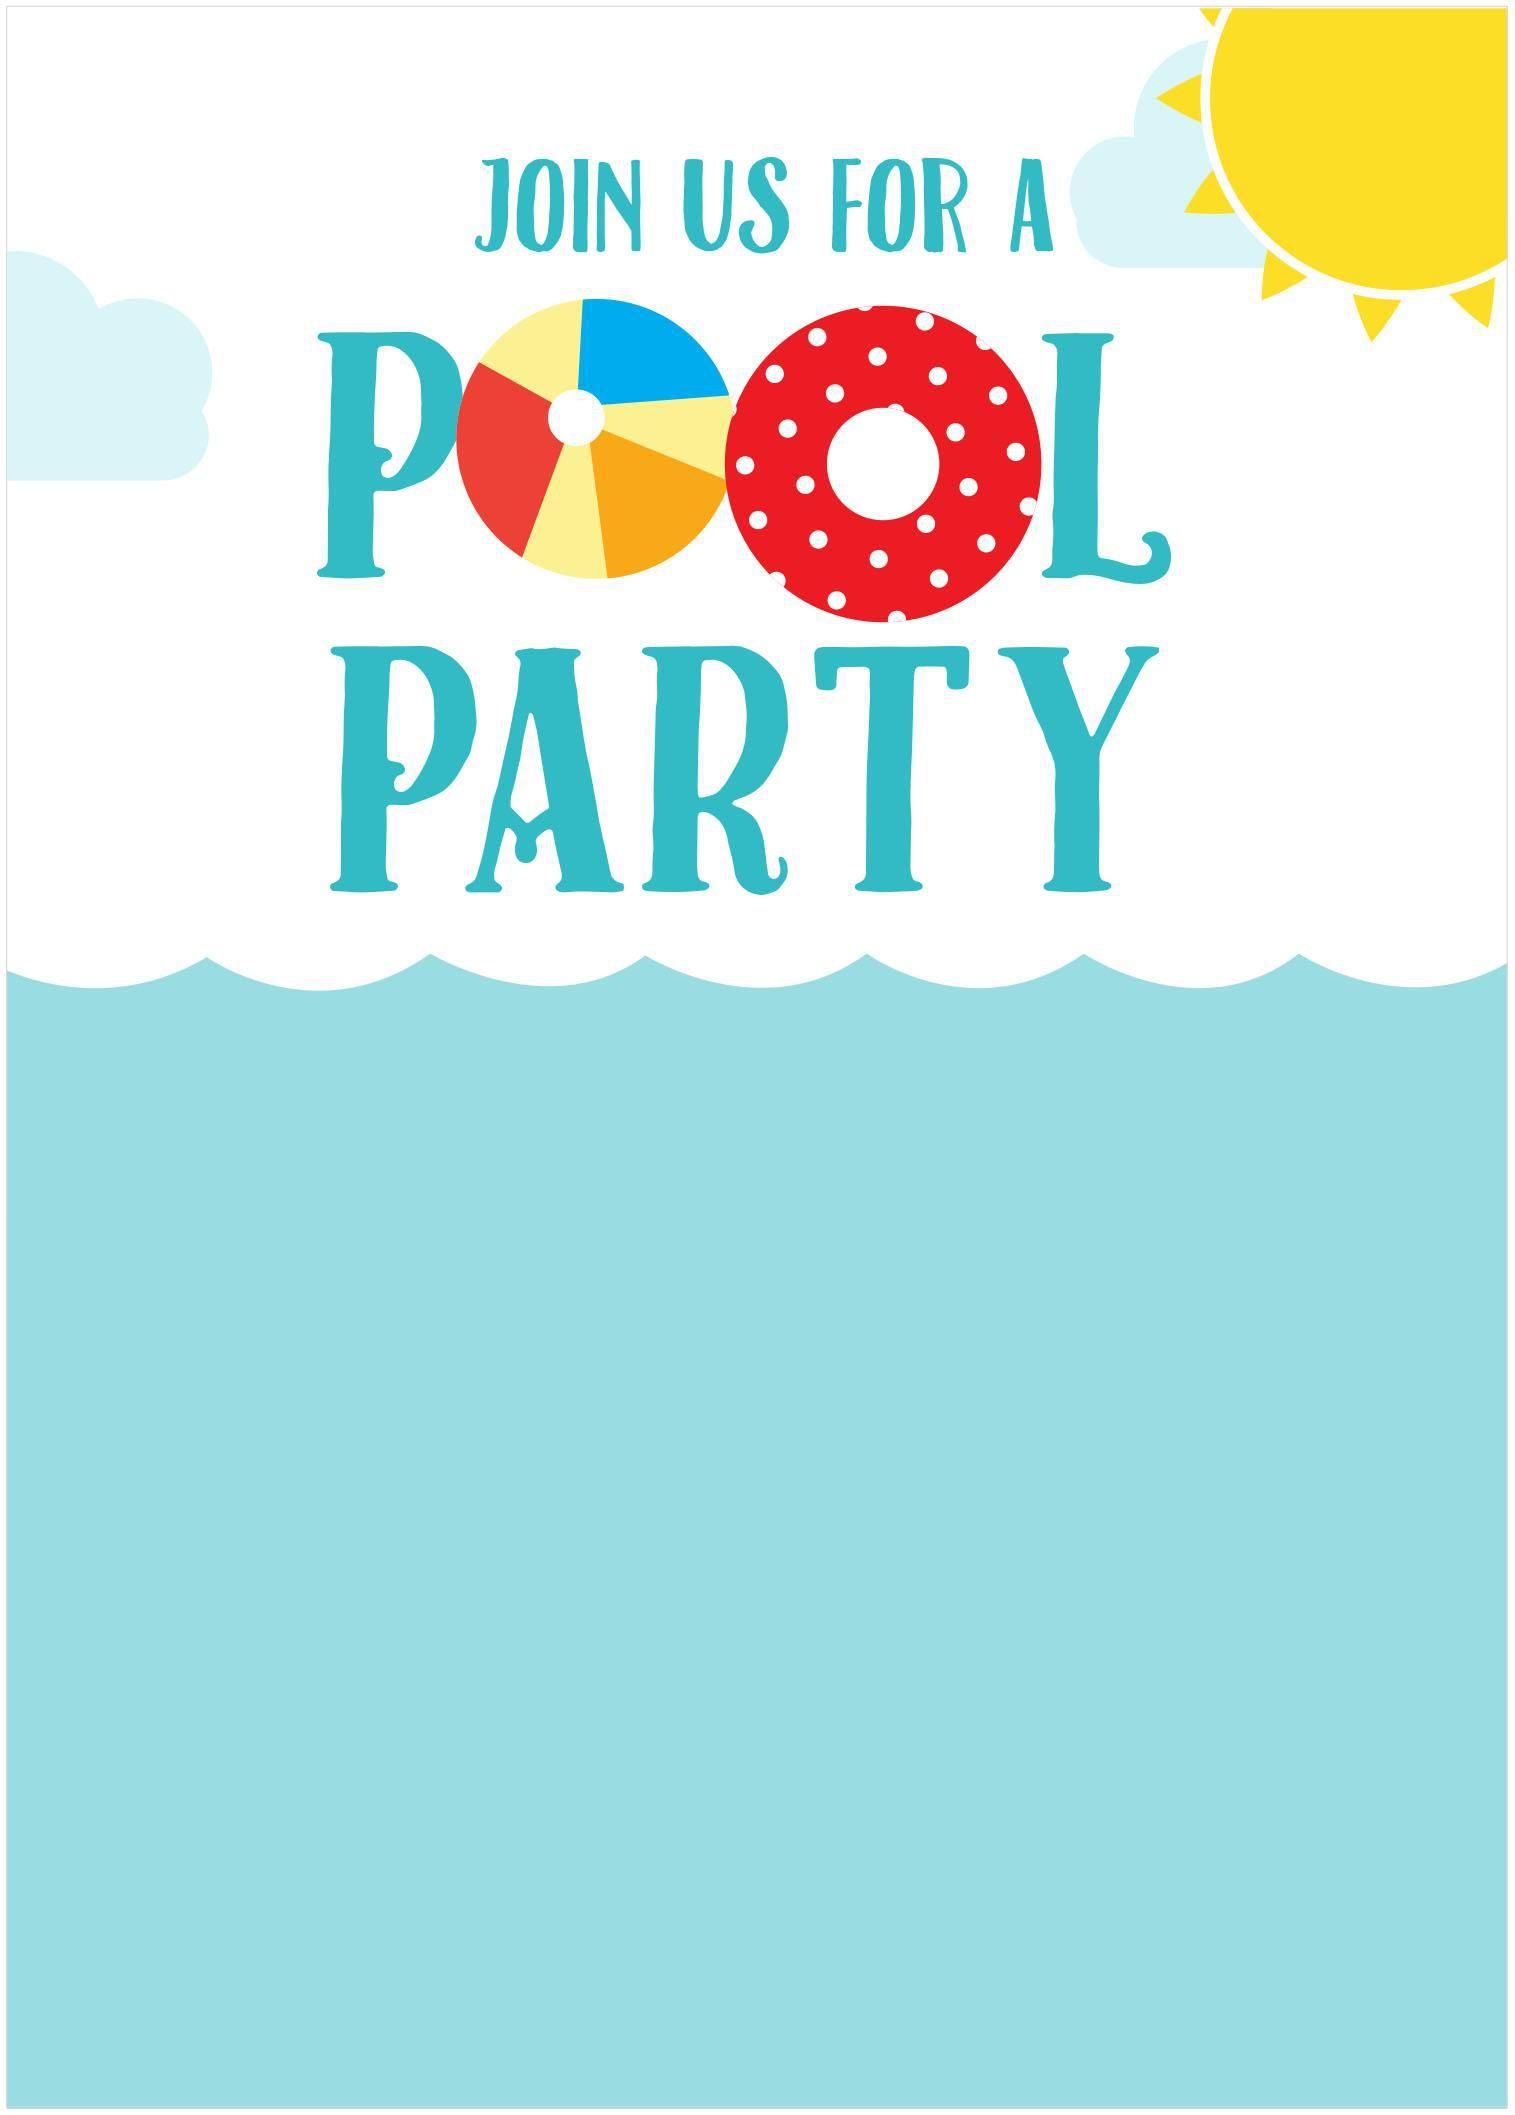 003 Formidable Free Invite Design Printable Image  Wedding Place Card Template Birthday To PrintFull